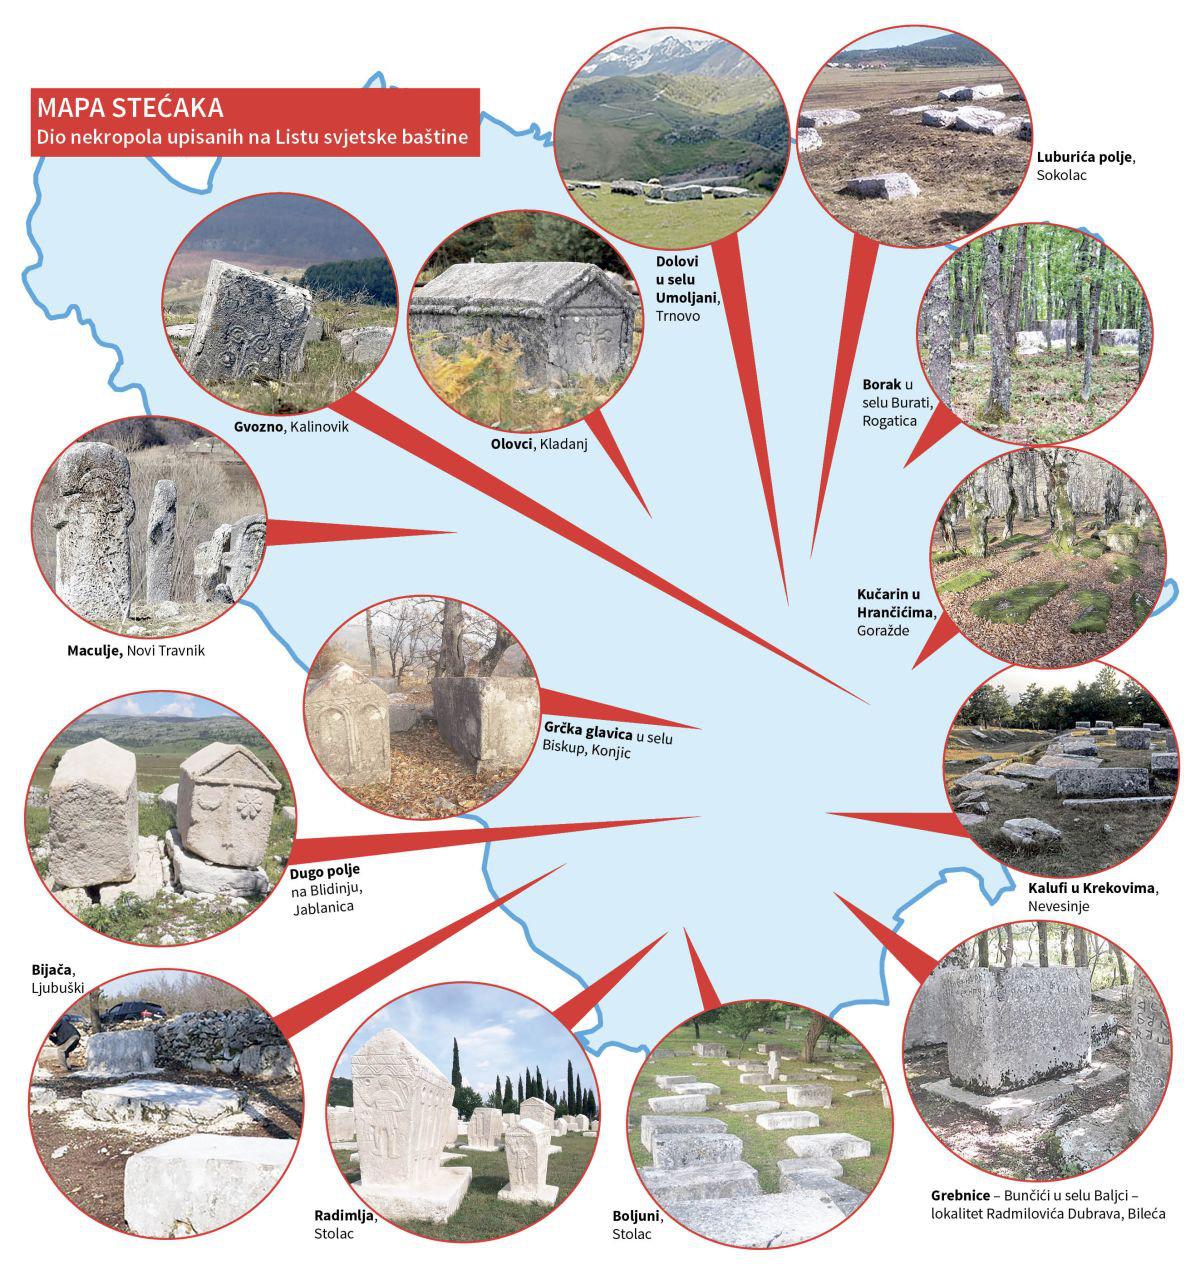 Stećci megaliths tombstones map, Bosnia & Herzegovina.